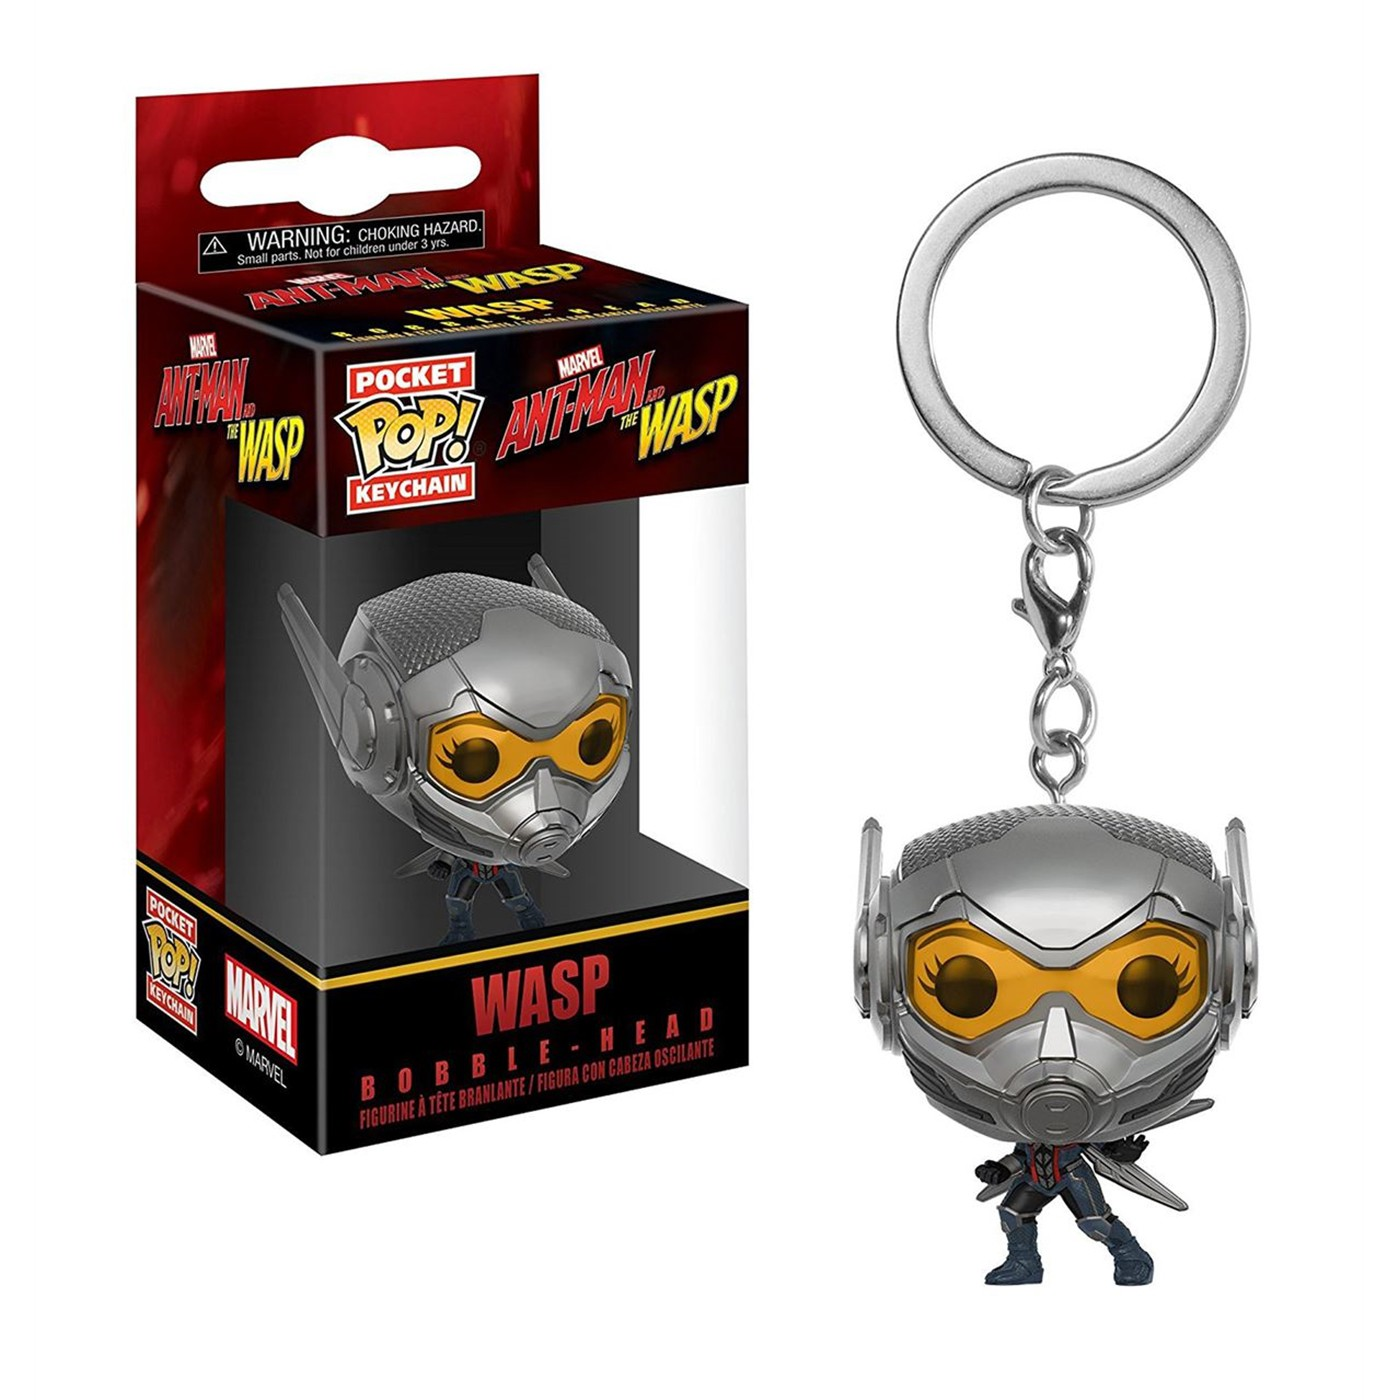 "Ant-Man & The Wasp ""Wasp"" Pocket Pop Keychain"